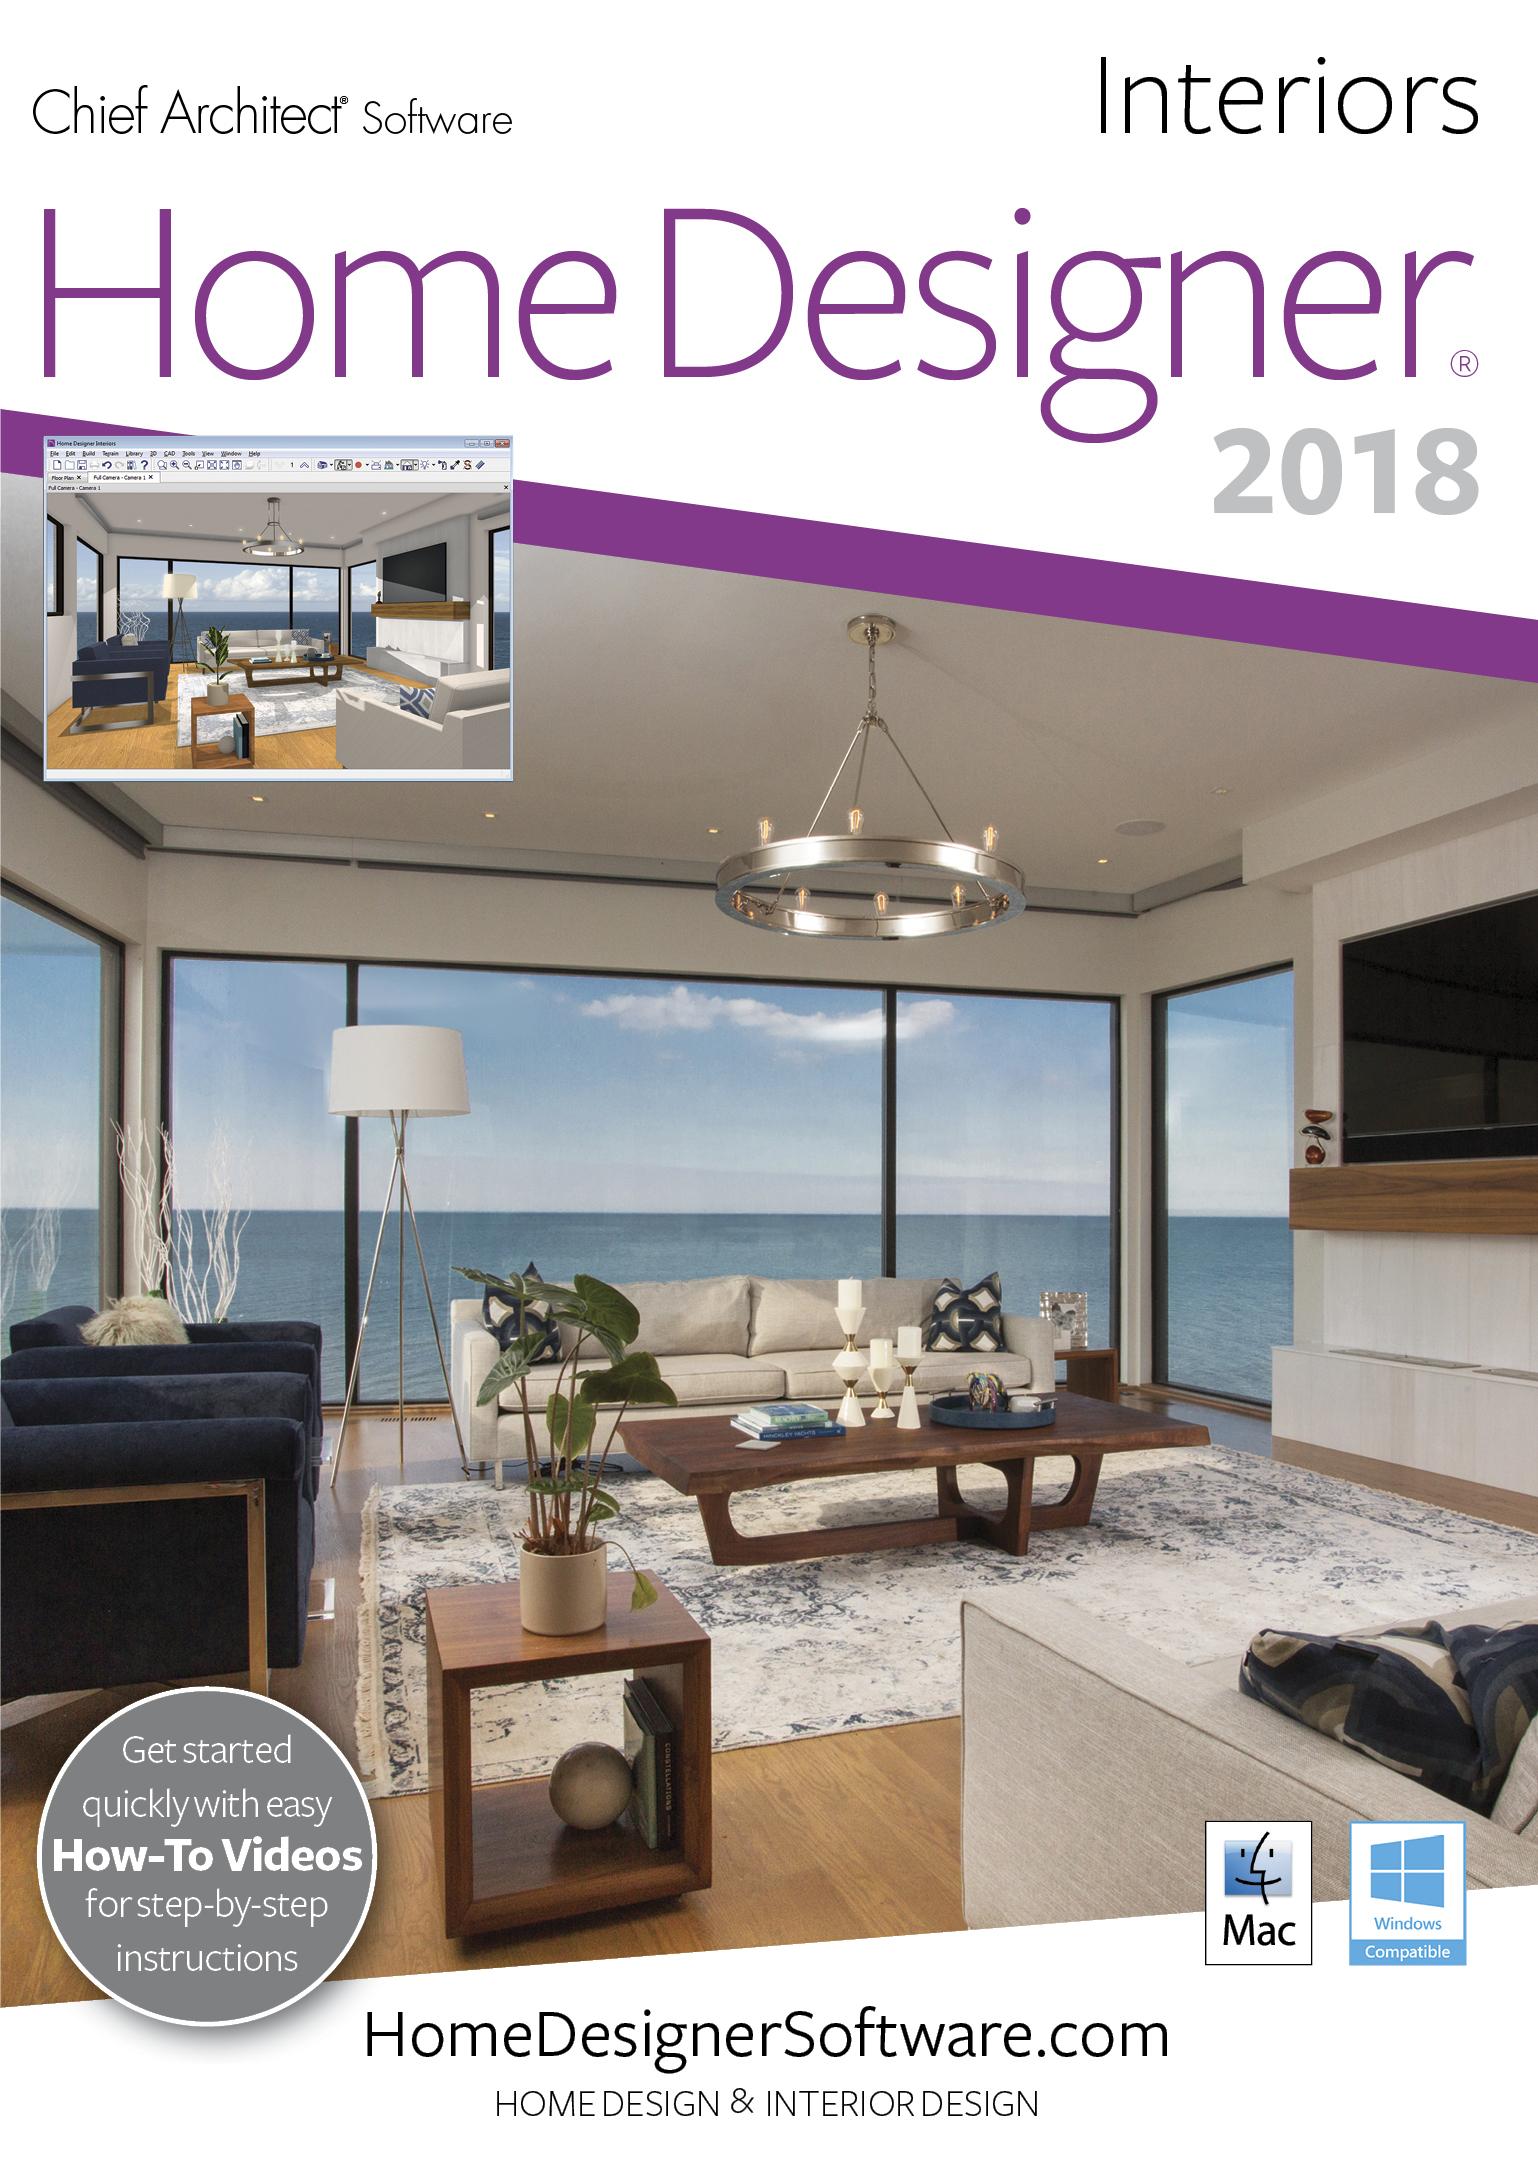 home-designer-interiors-2018-pc-download-telechargement